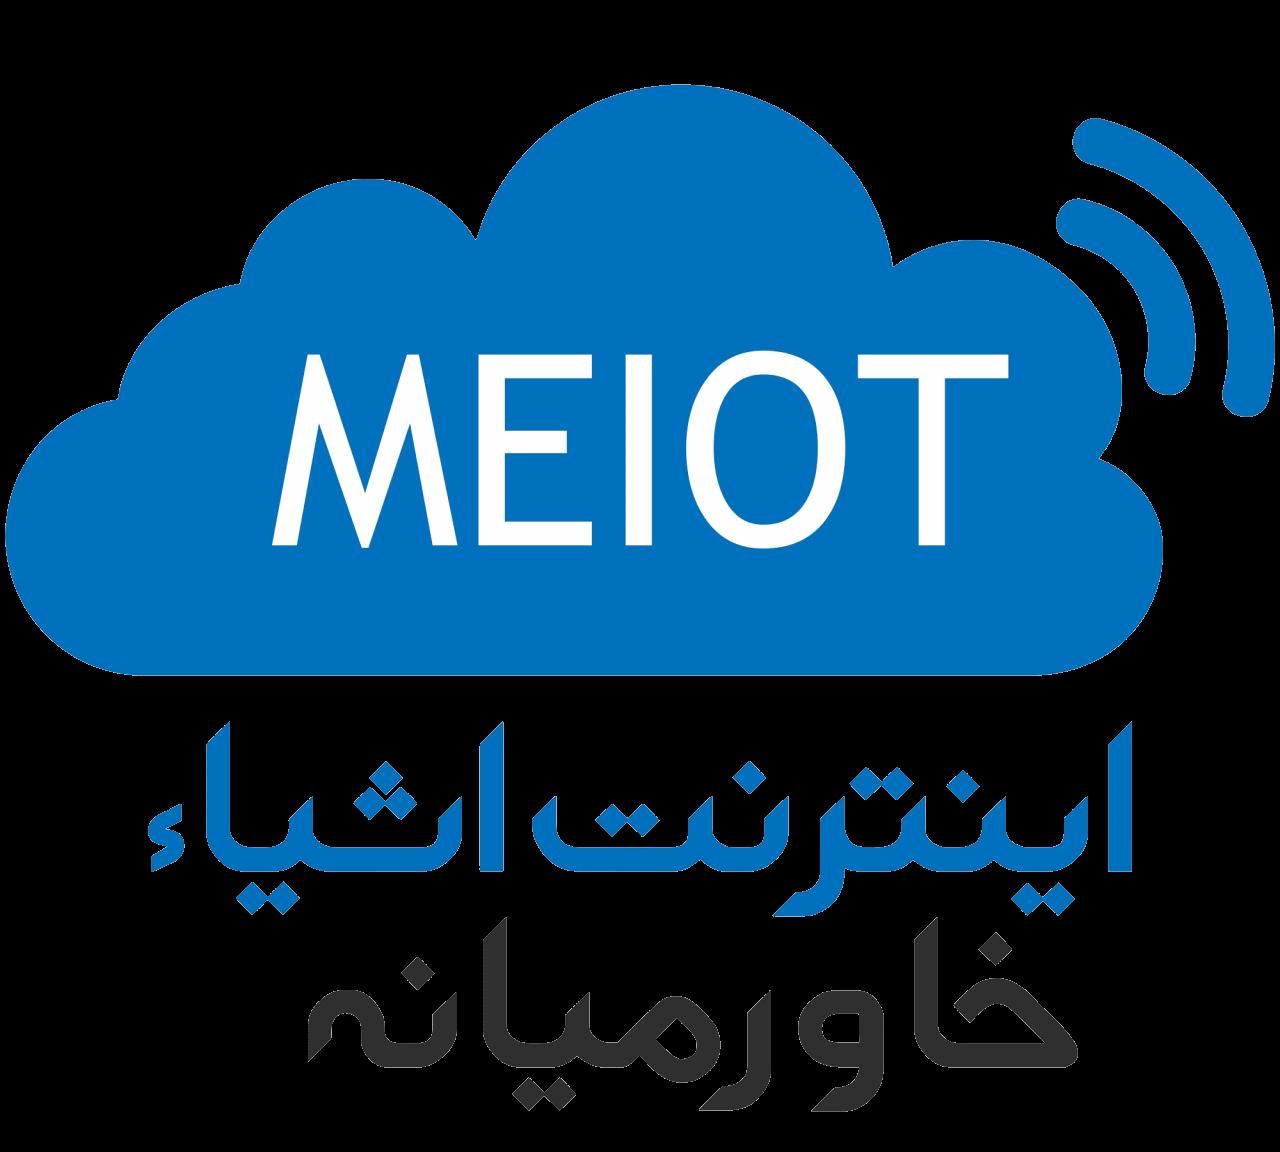 MEIOT-LOGO